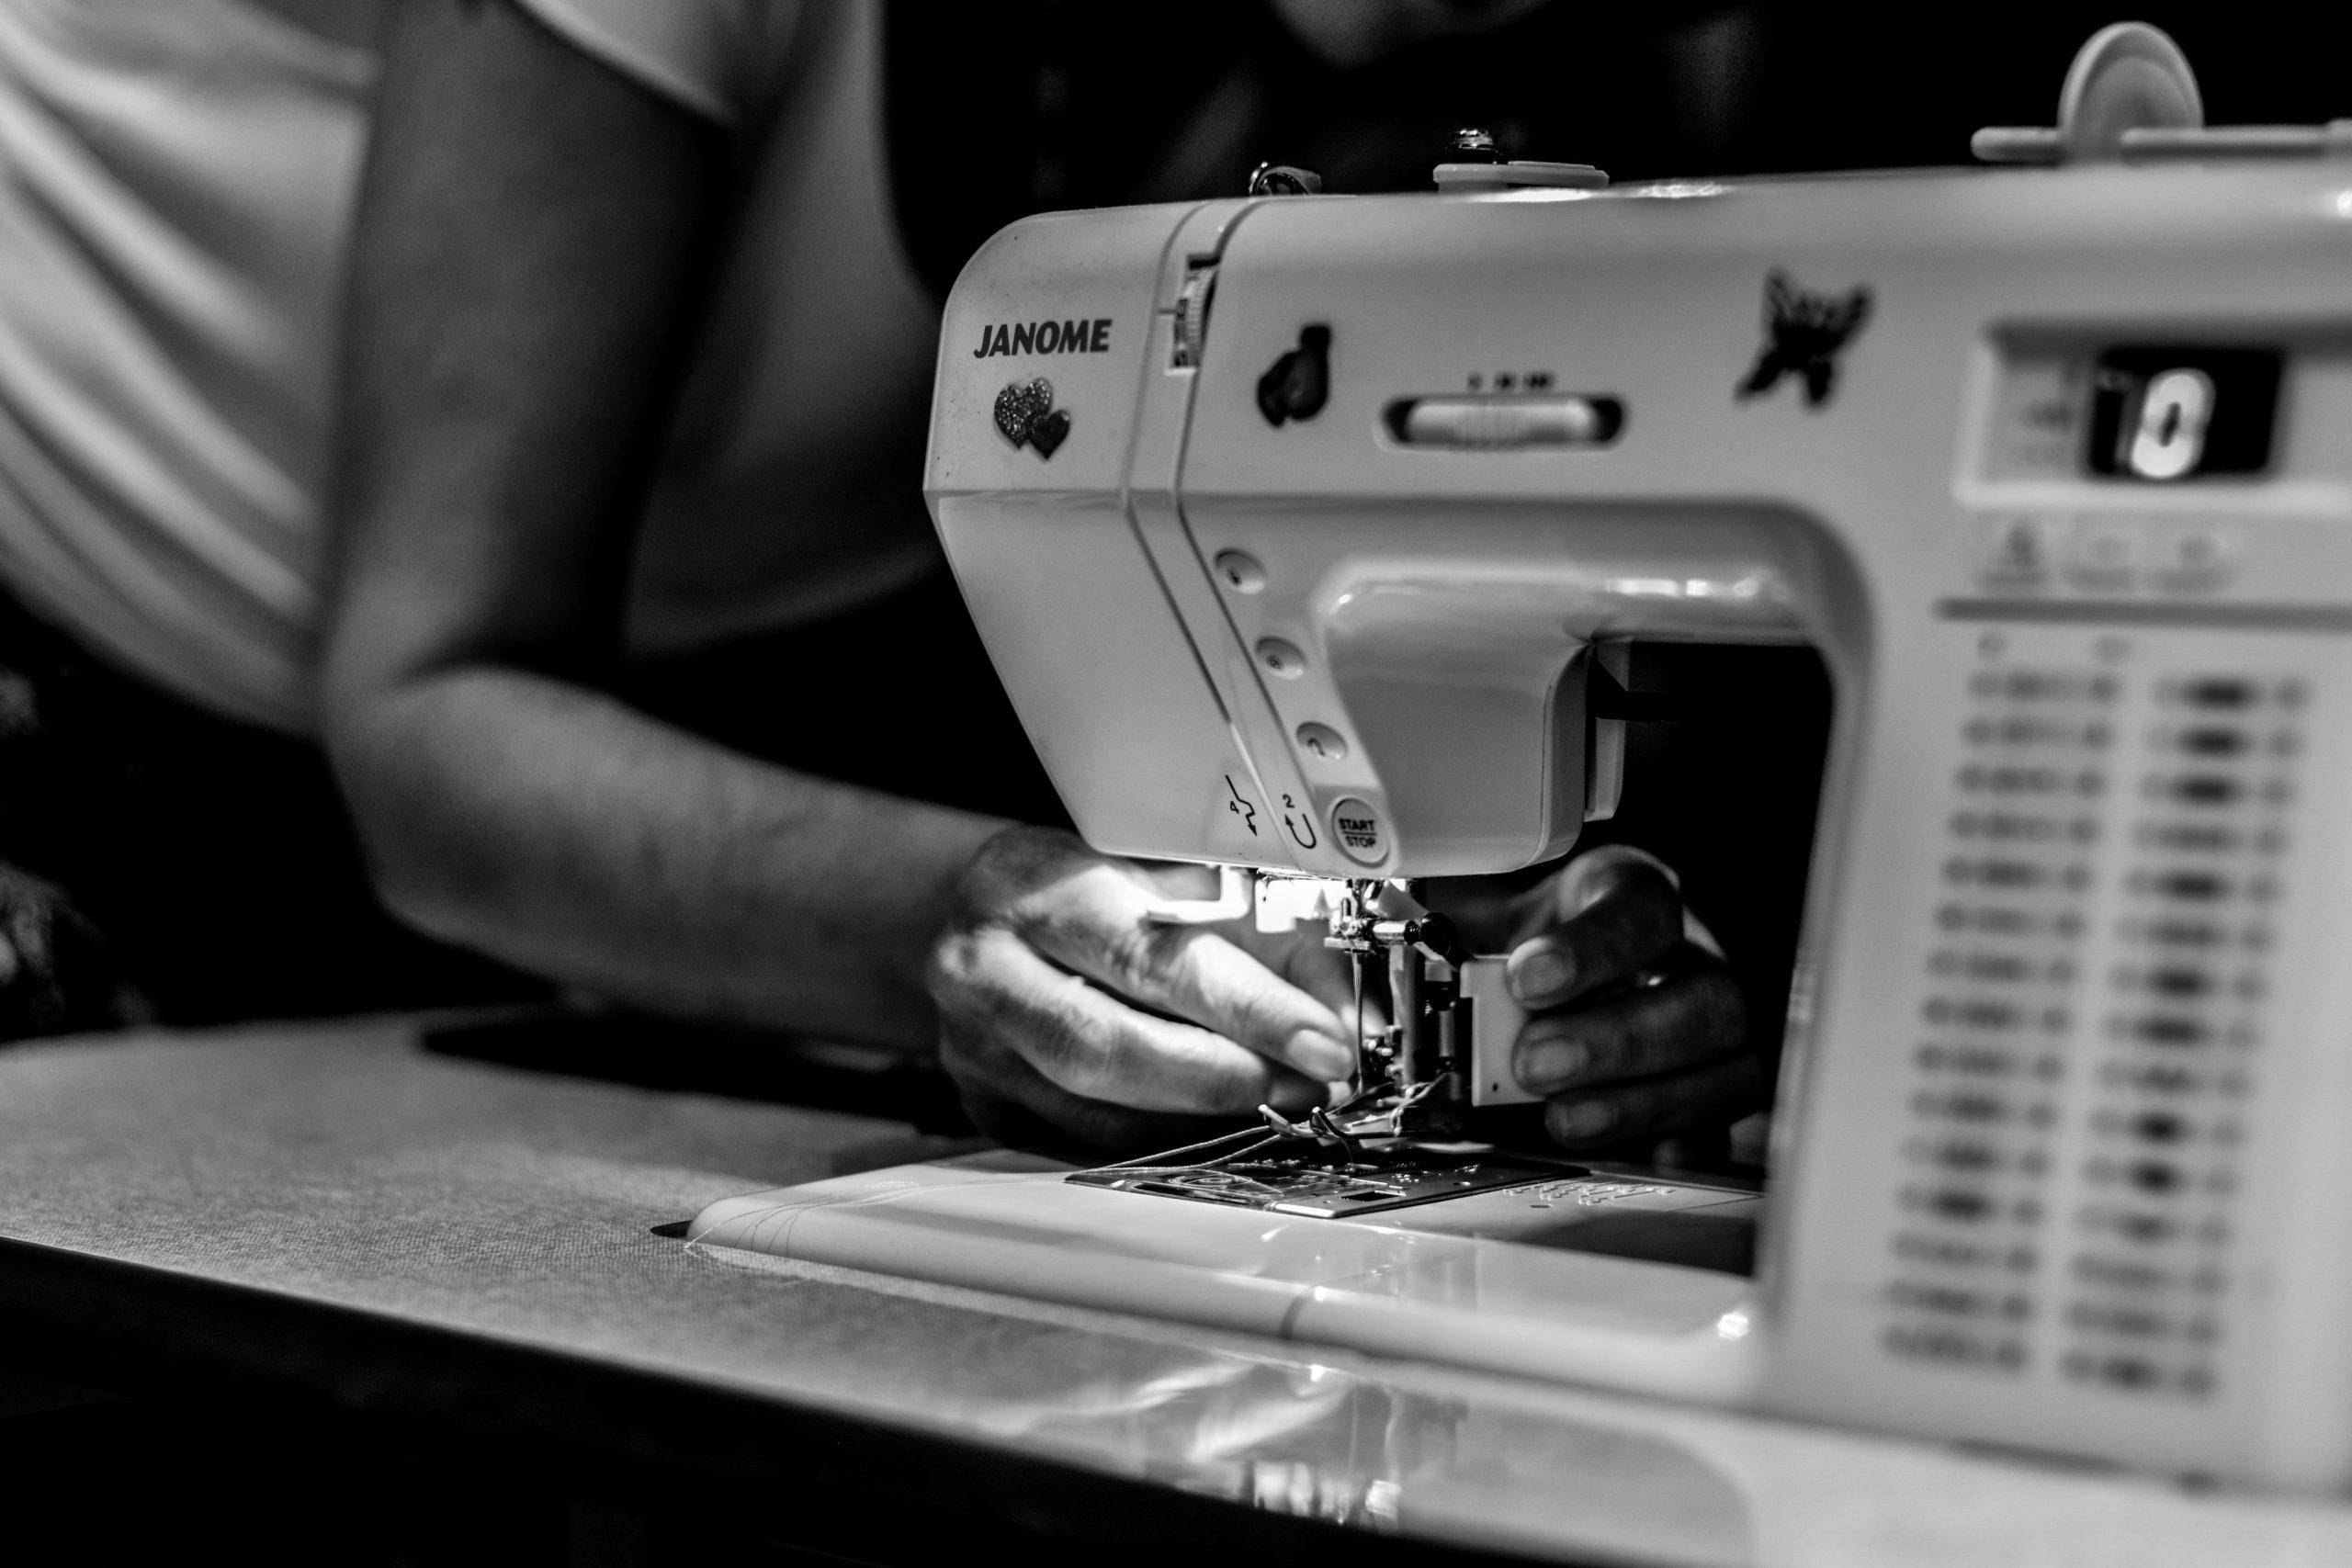 Industria textil, textiles